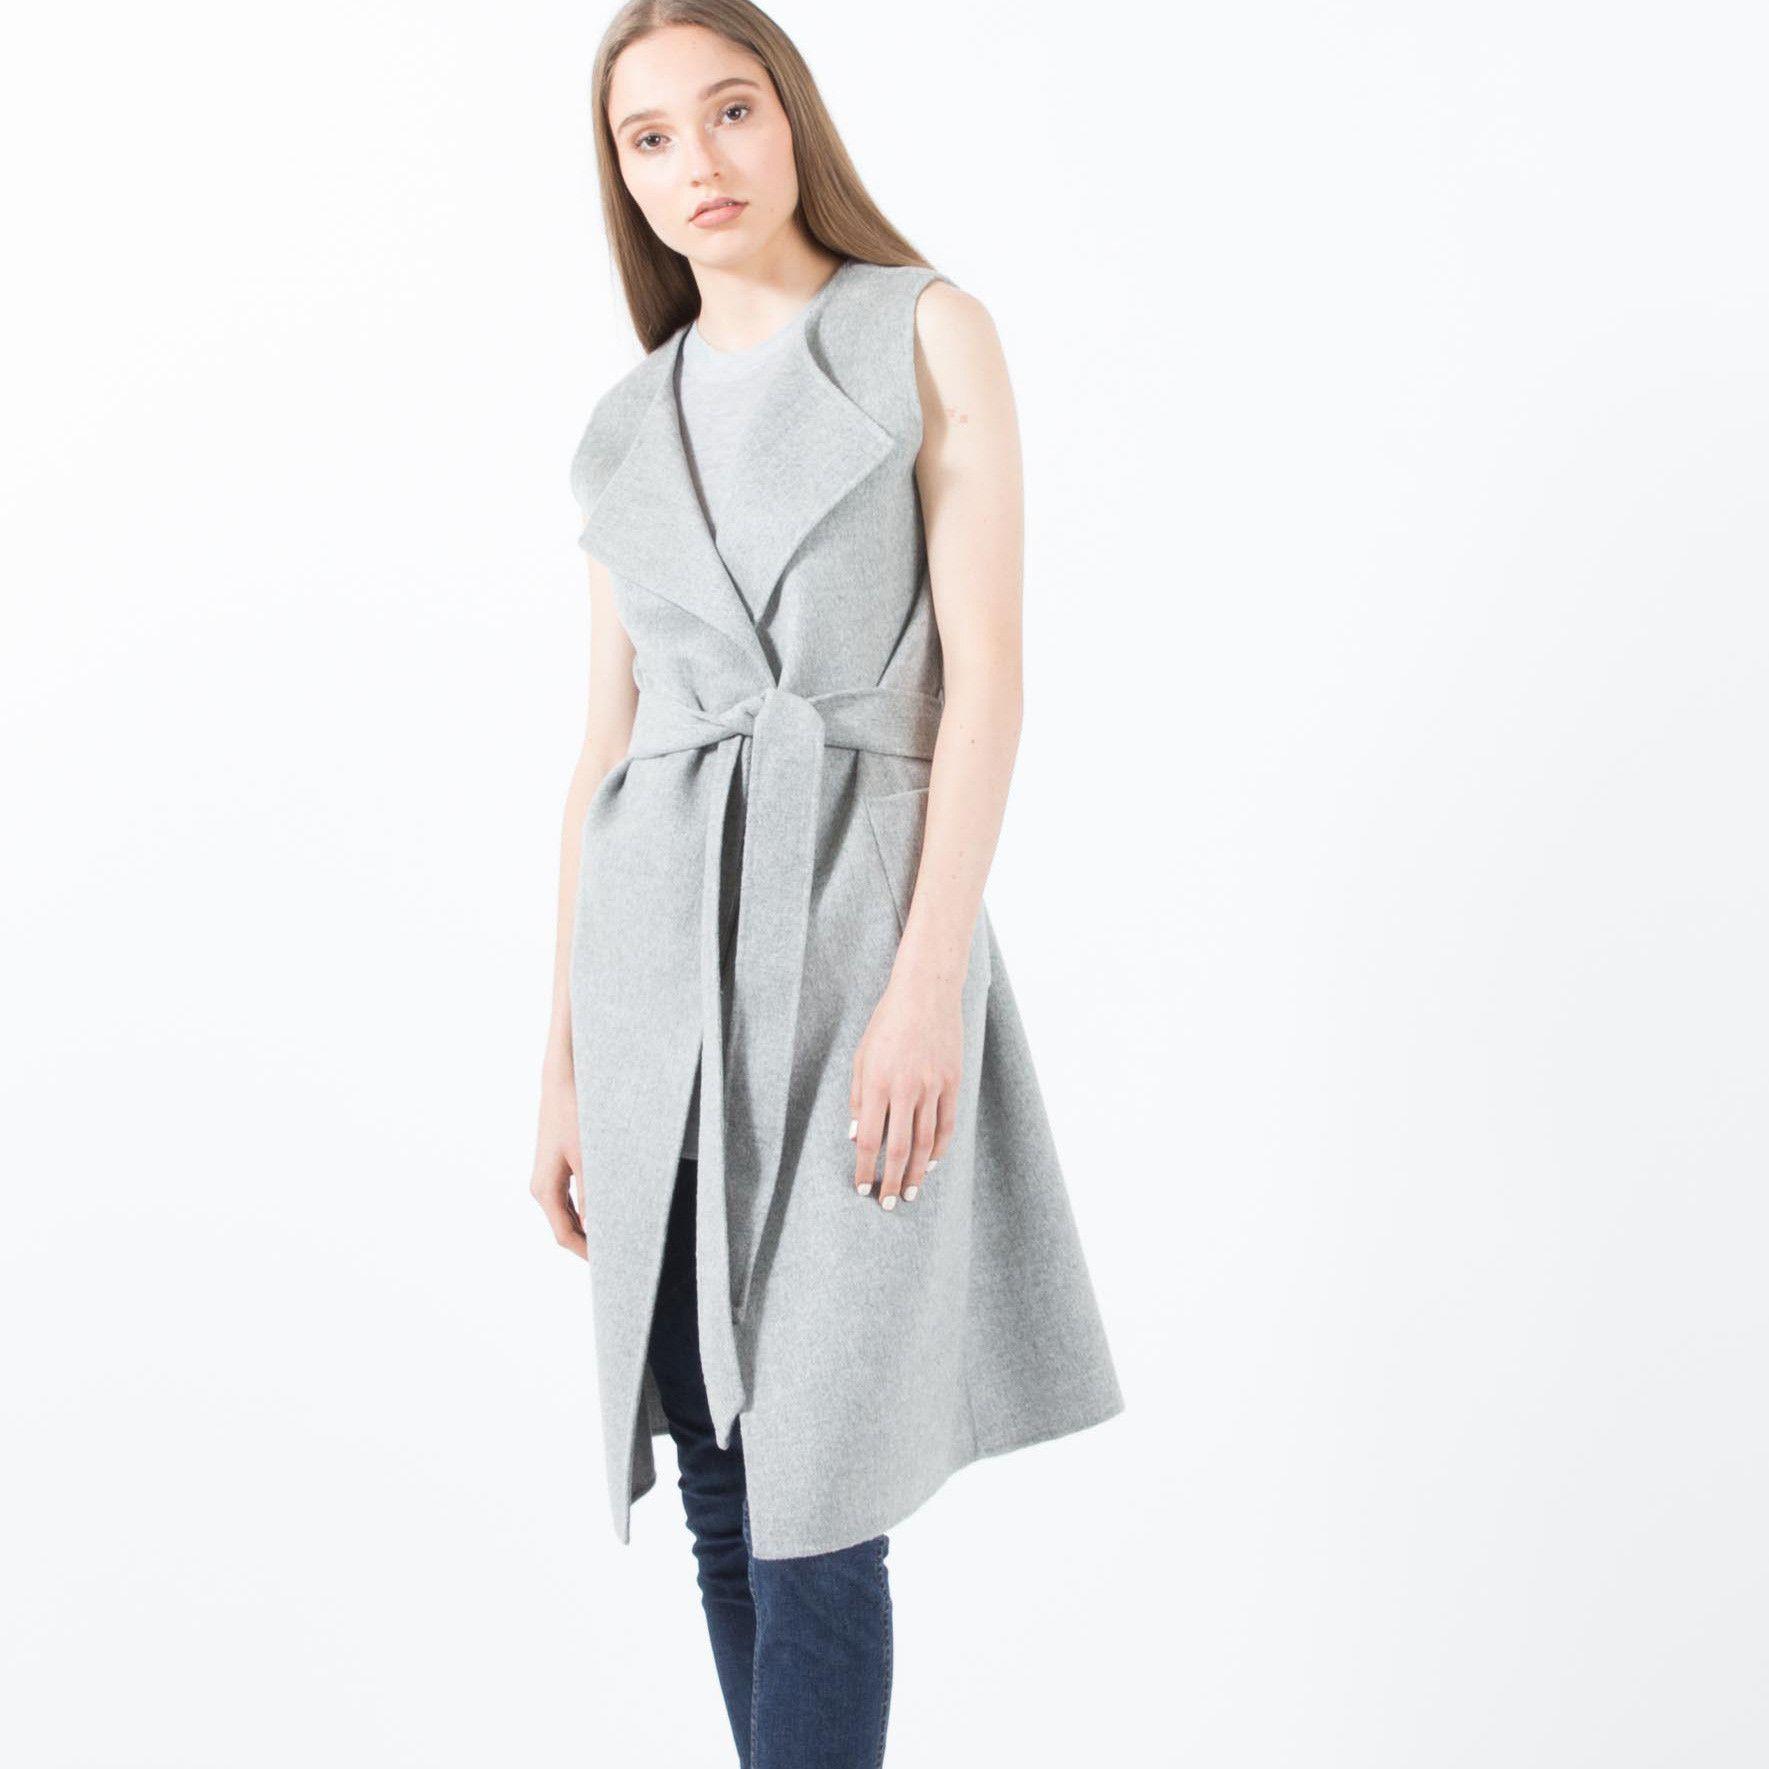 Olympia Handmade Cashmere Convertible Coat (Grey) | Modern Citizen